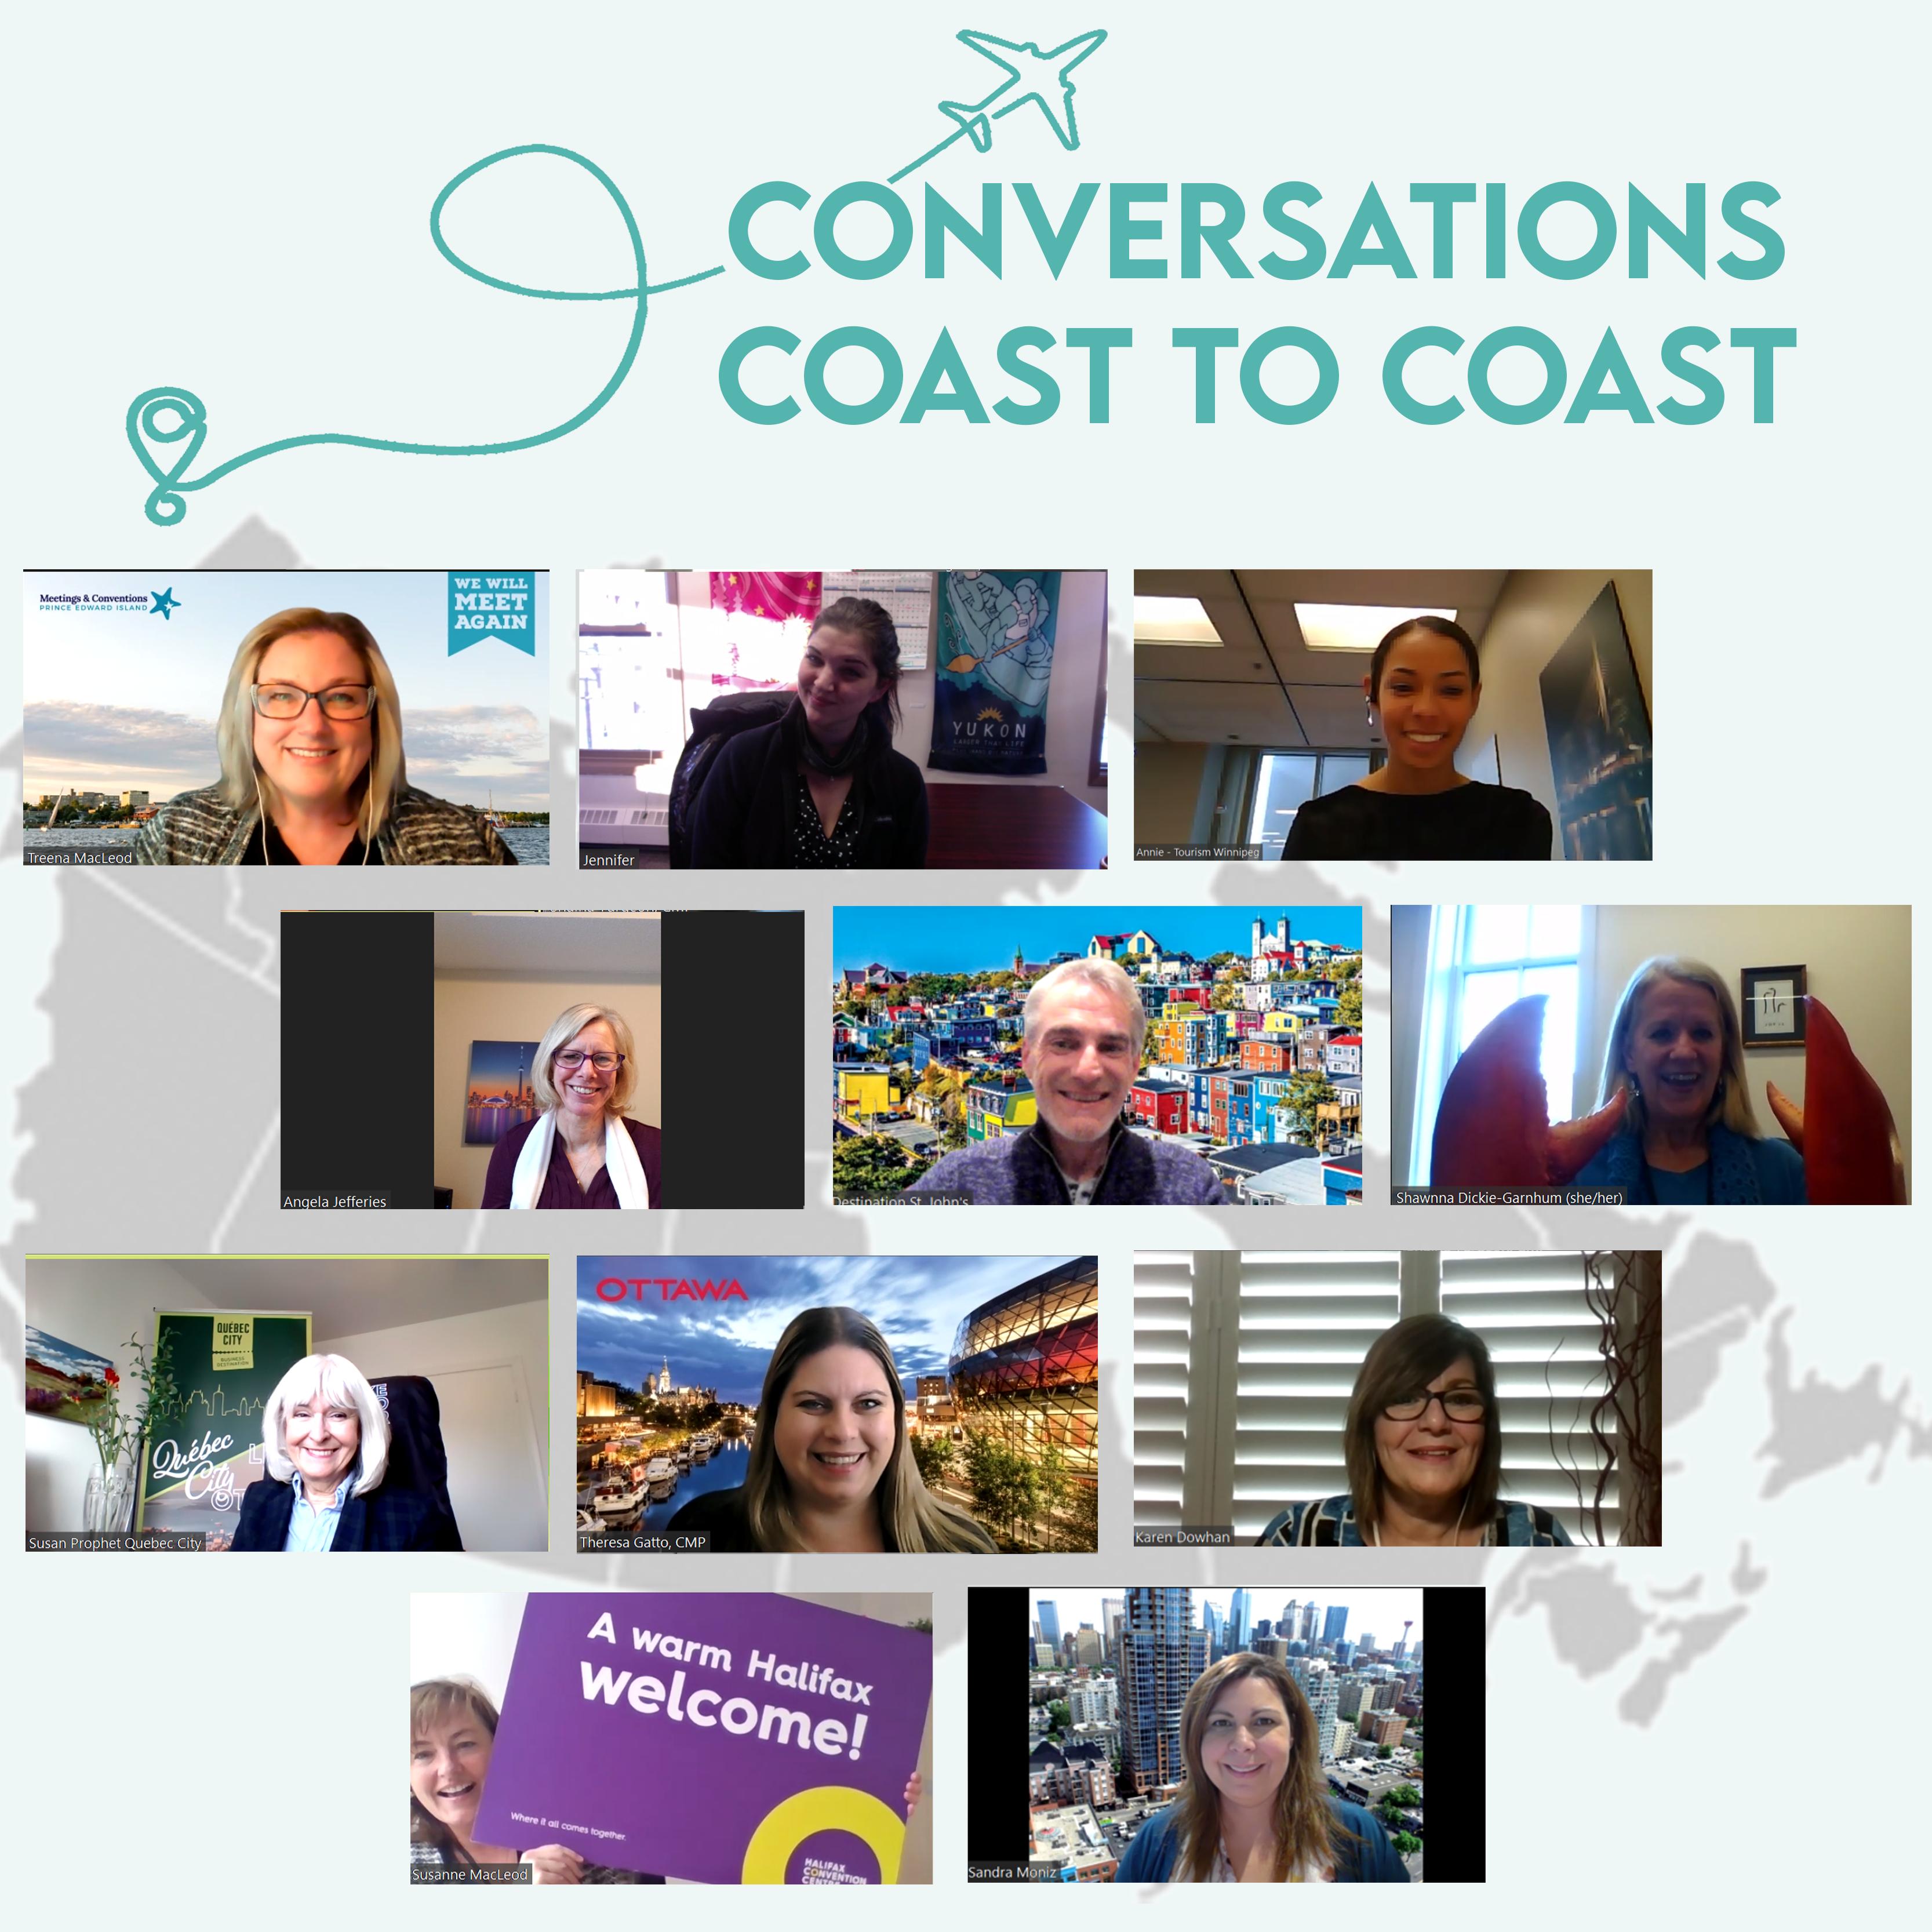 Conversations Coast to Coast Collage